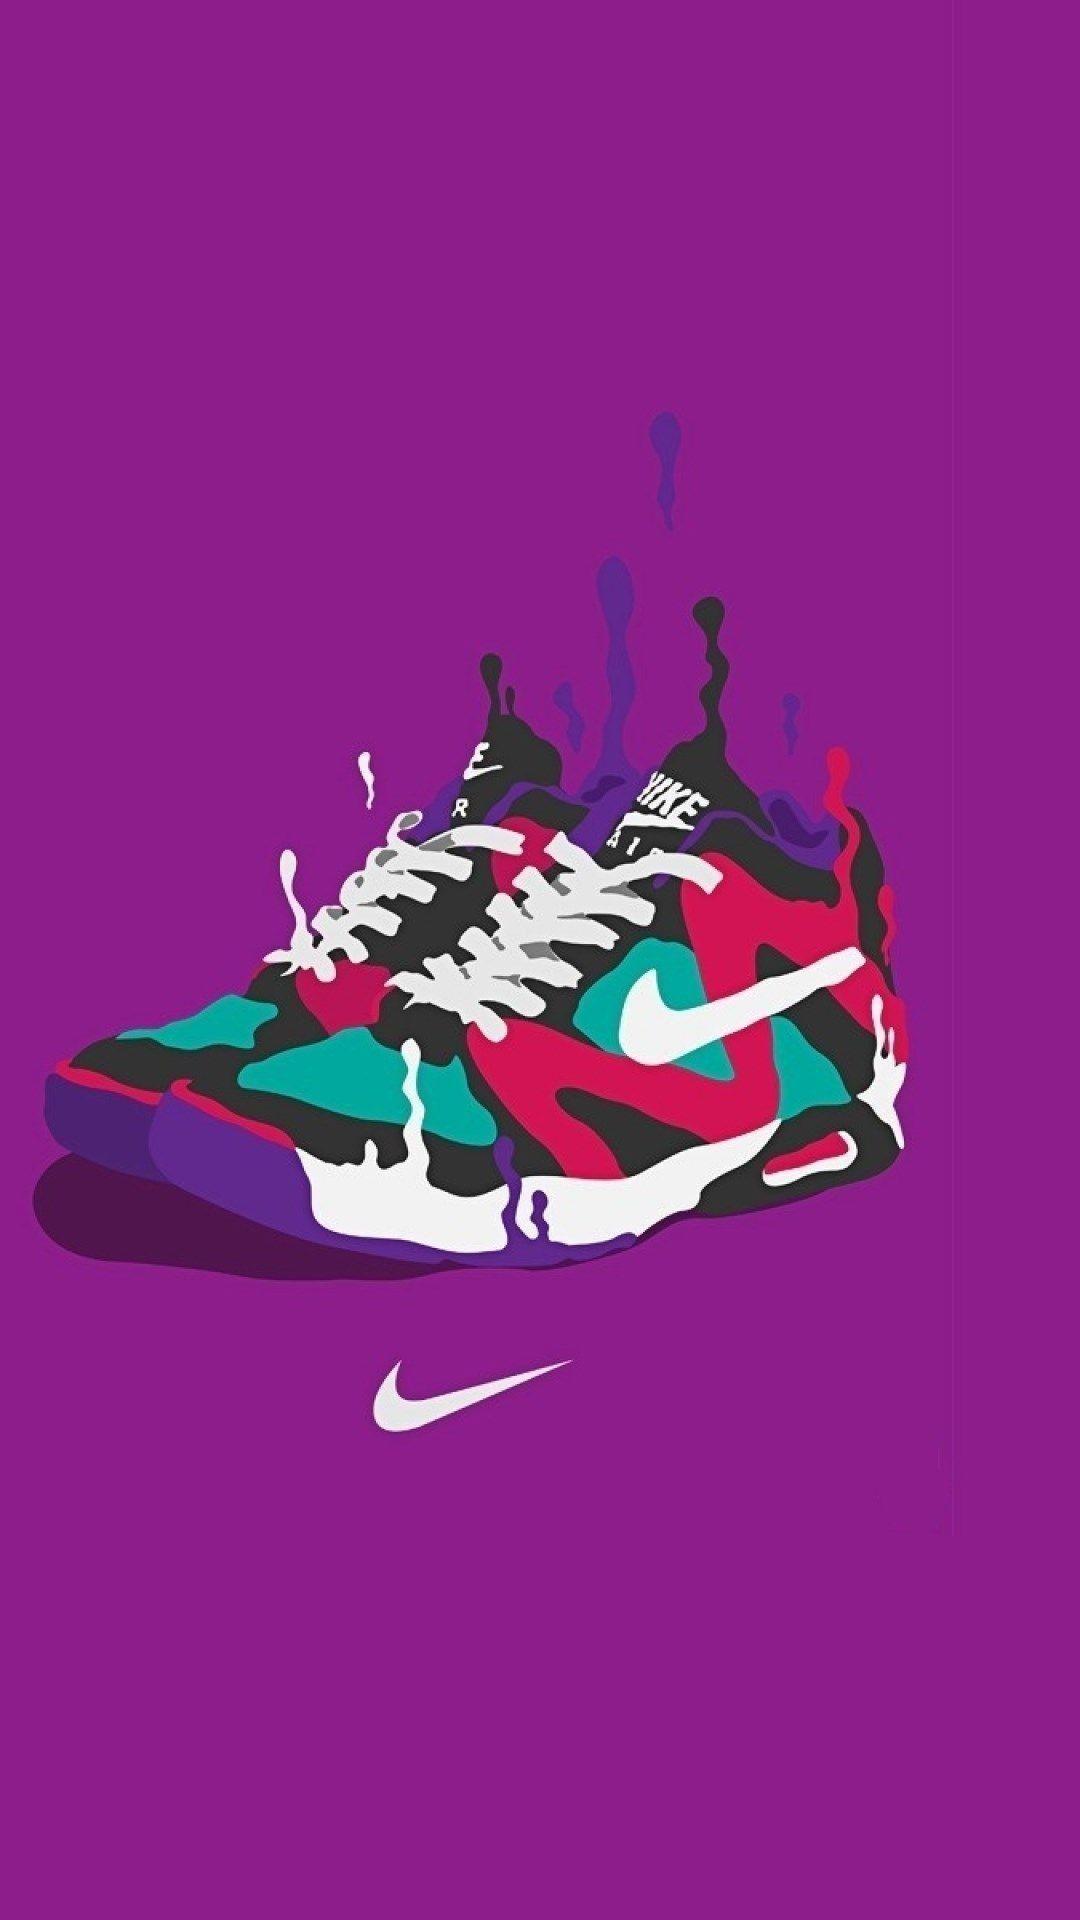 Nike Cartoon iPhone Wallpapers - Top